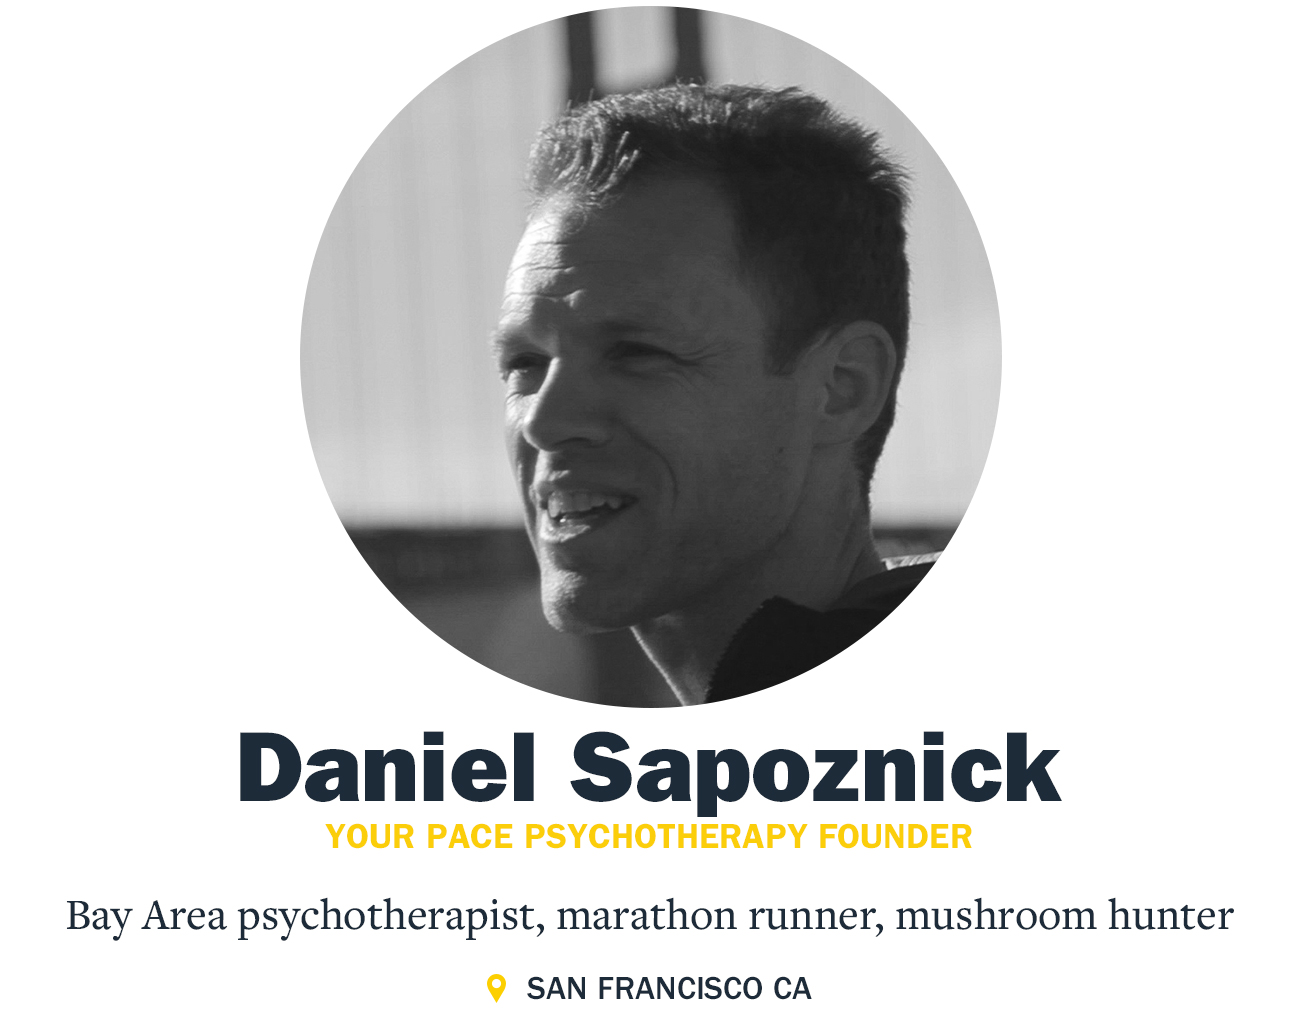 Daniel Sapoznick